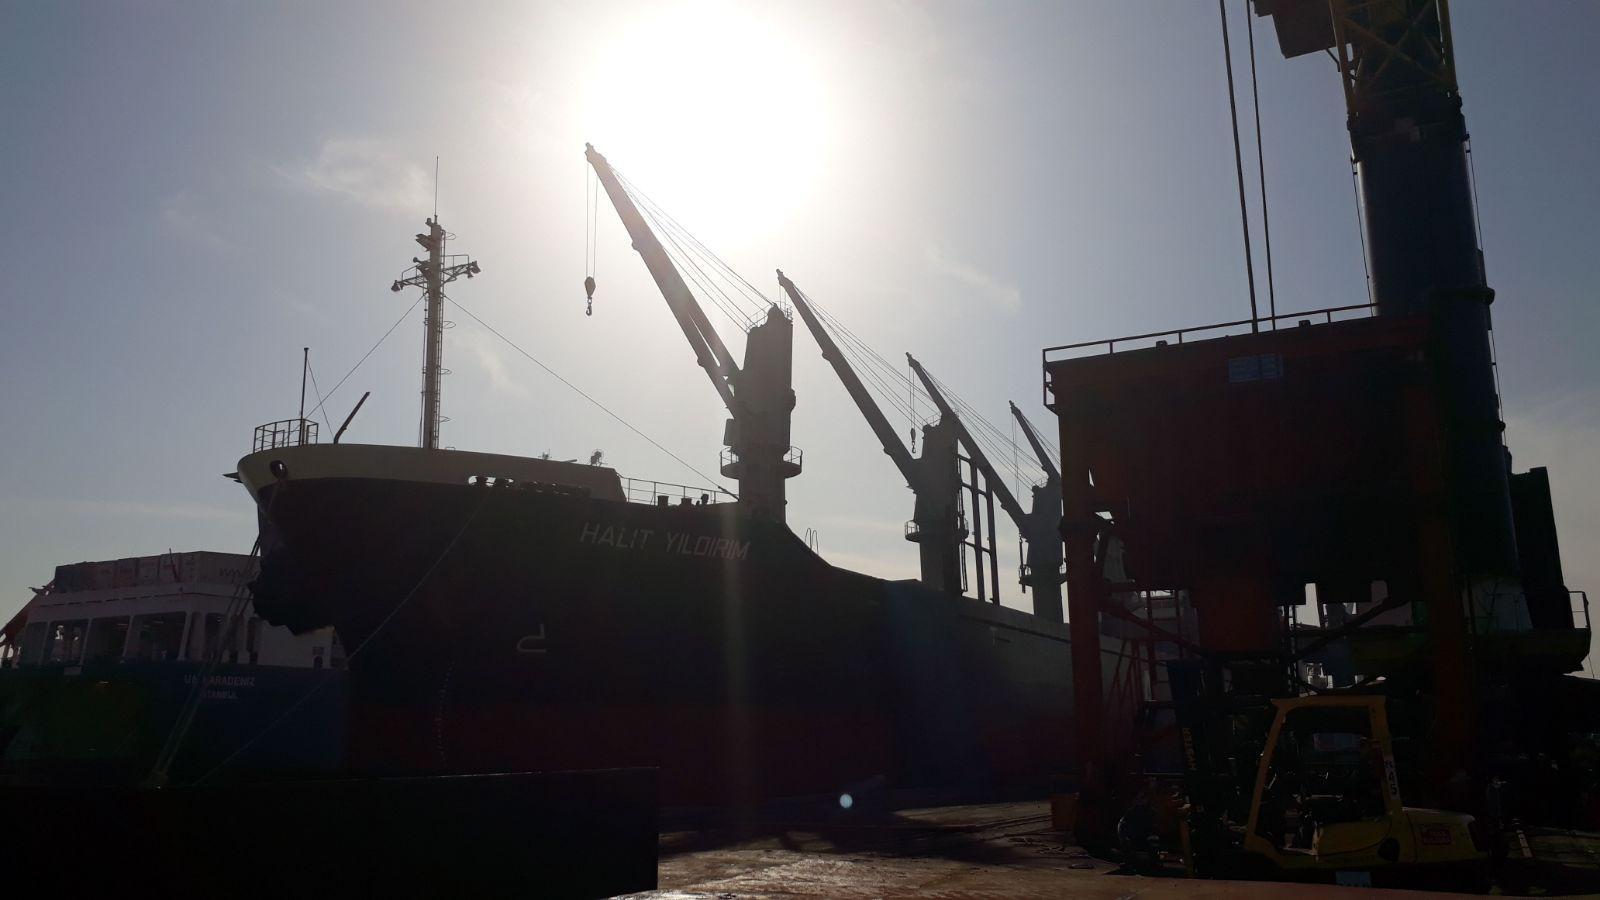 MV HALIT YILDIRIM – DISCHARGING